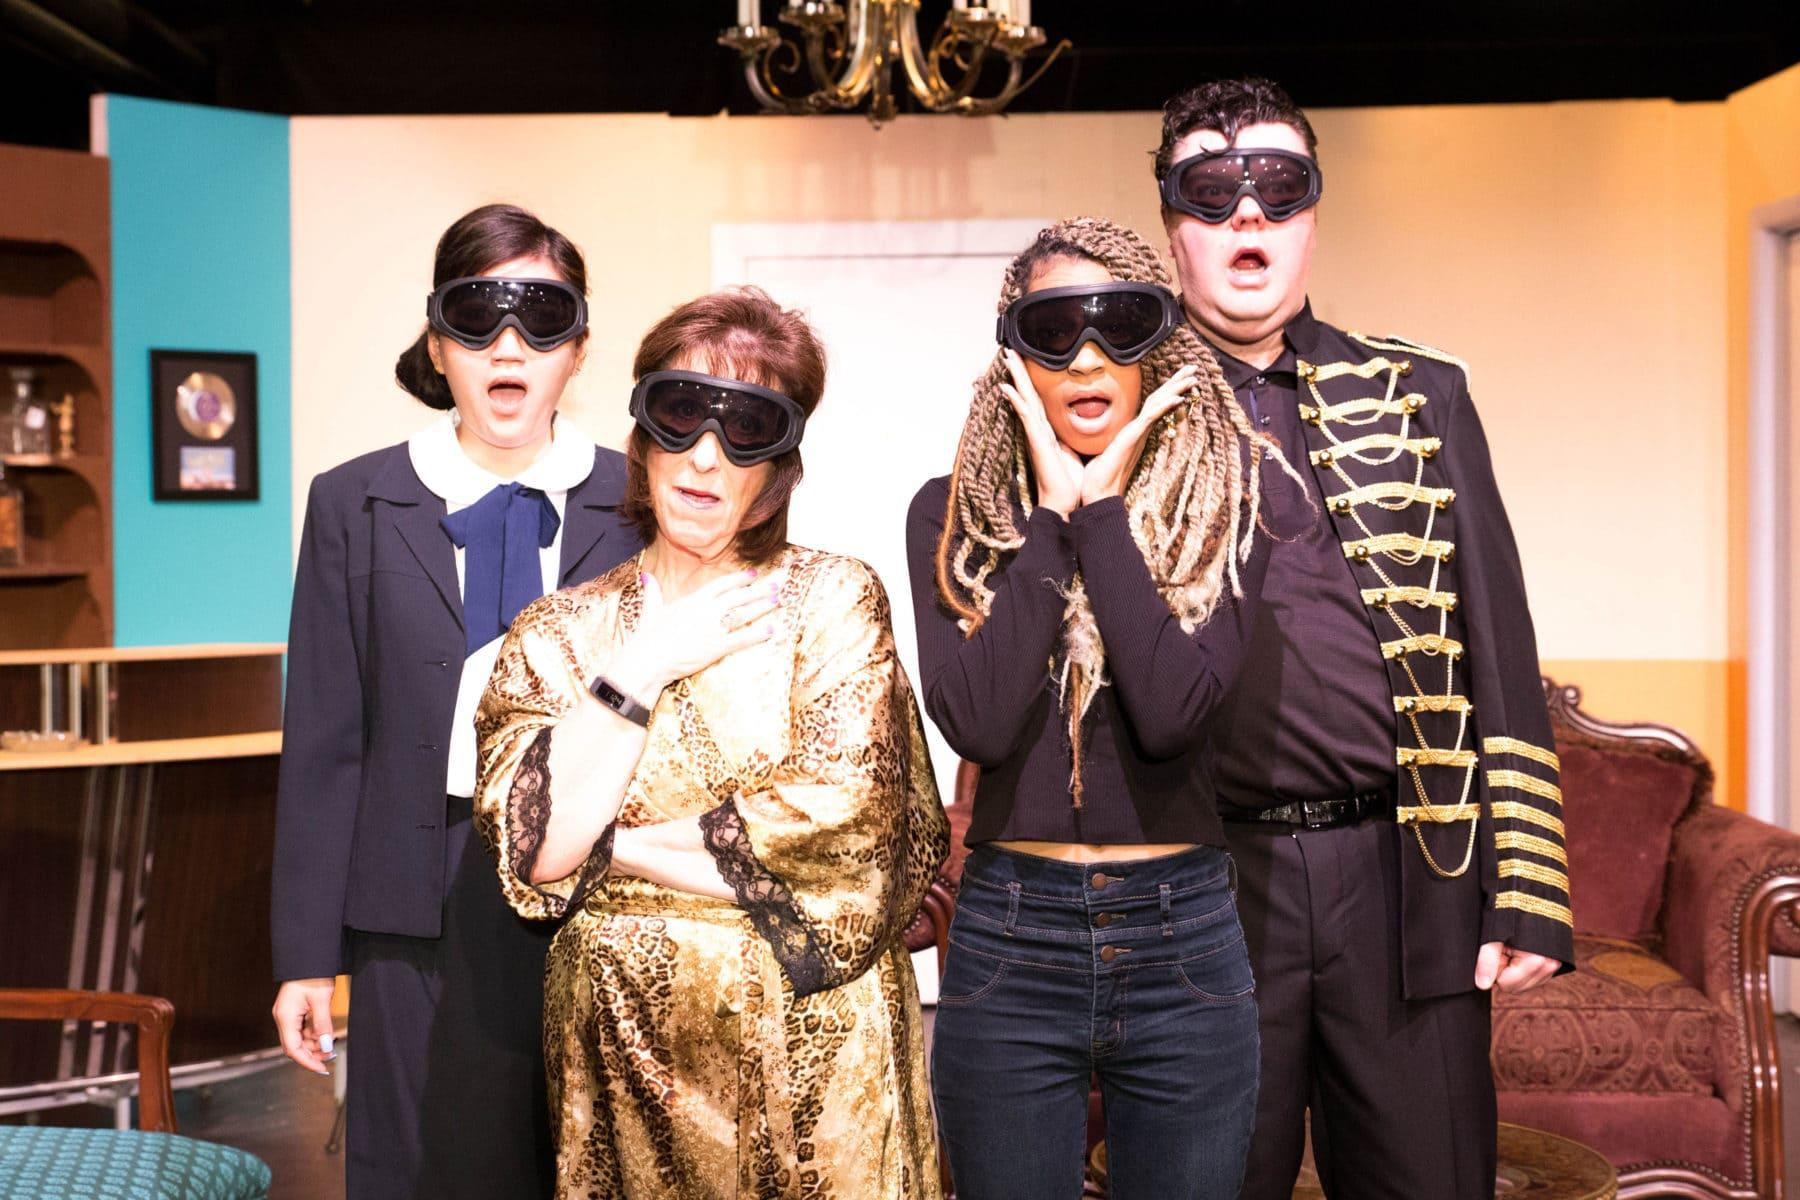 MK (Joy Liu), Beatrice (Joy Gerst), Flo (Tawny Rucker), and Mort (Brian Stepowany) watch the bomb blast in Greenbelt Arts Center's production of 'The Honey Trap.' Photo by Kimberly Curren.